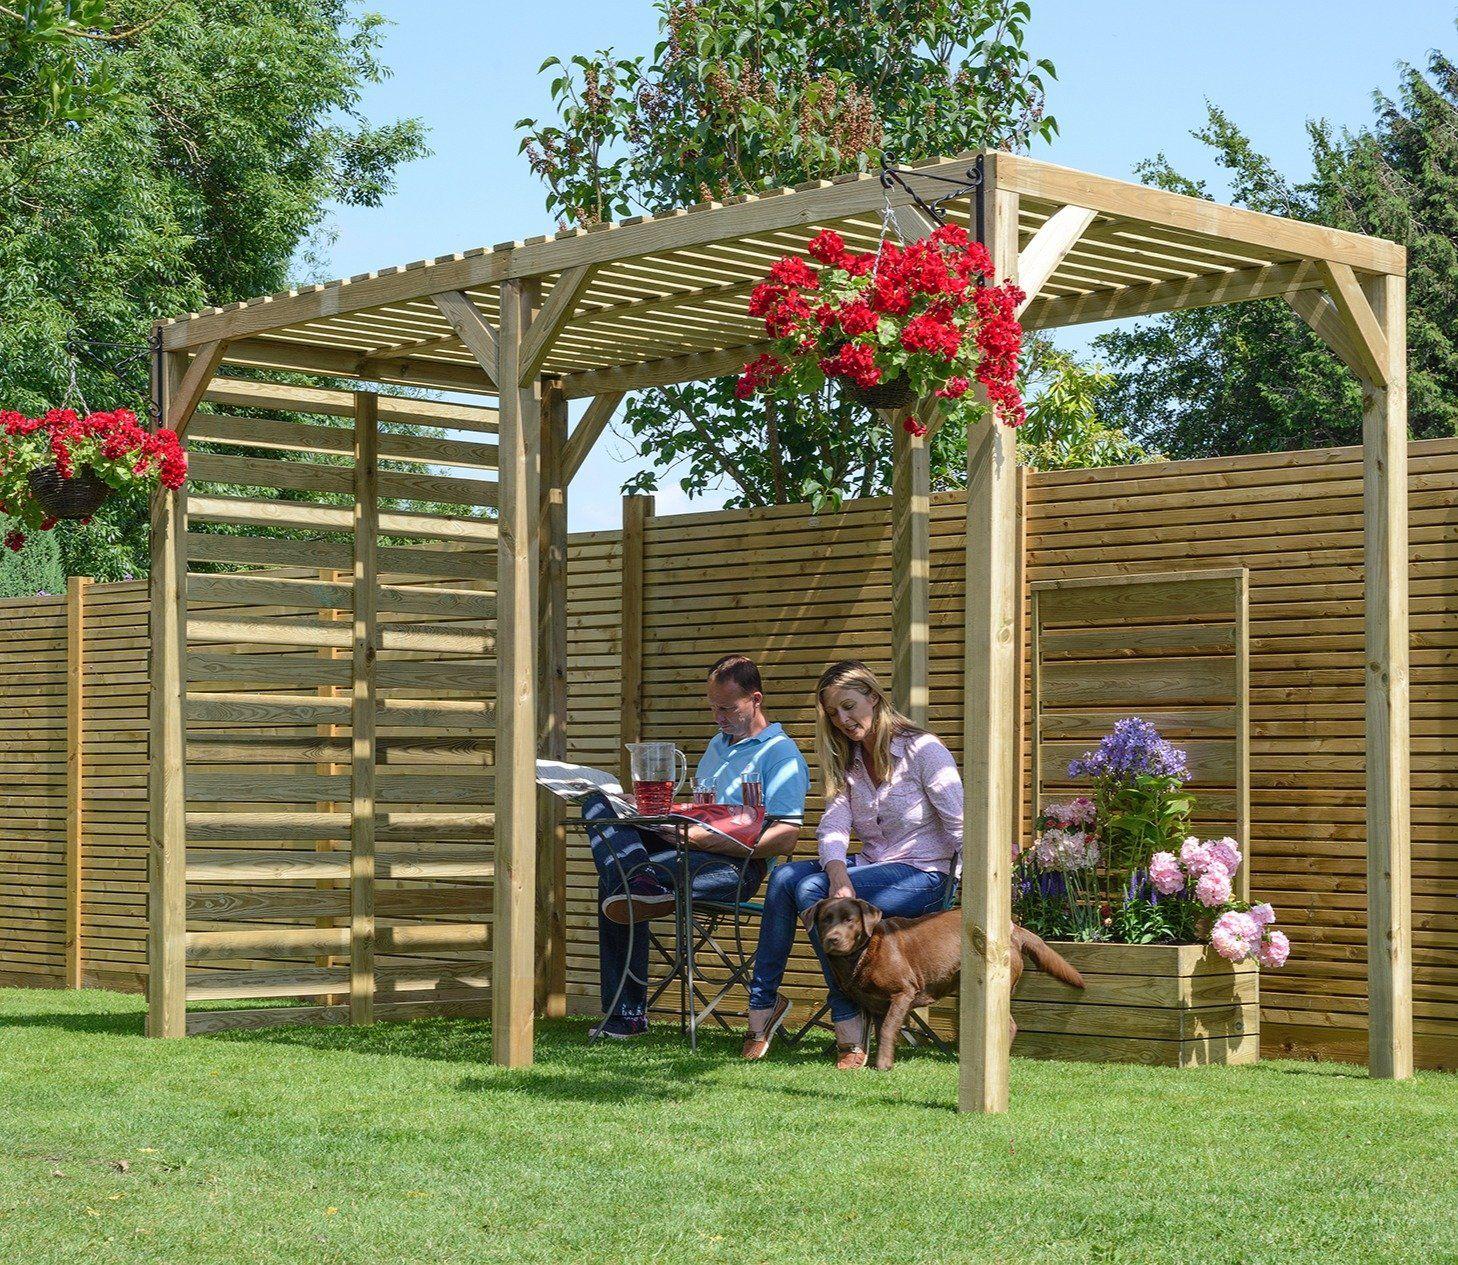 Pergola Roof Ideas Uk: Urban Garden, Garden Structures